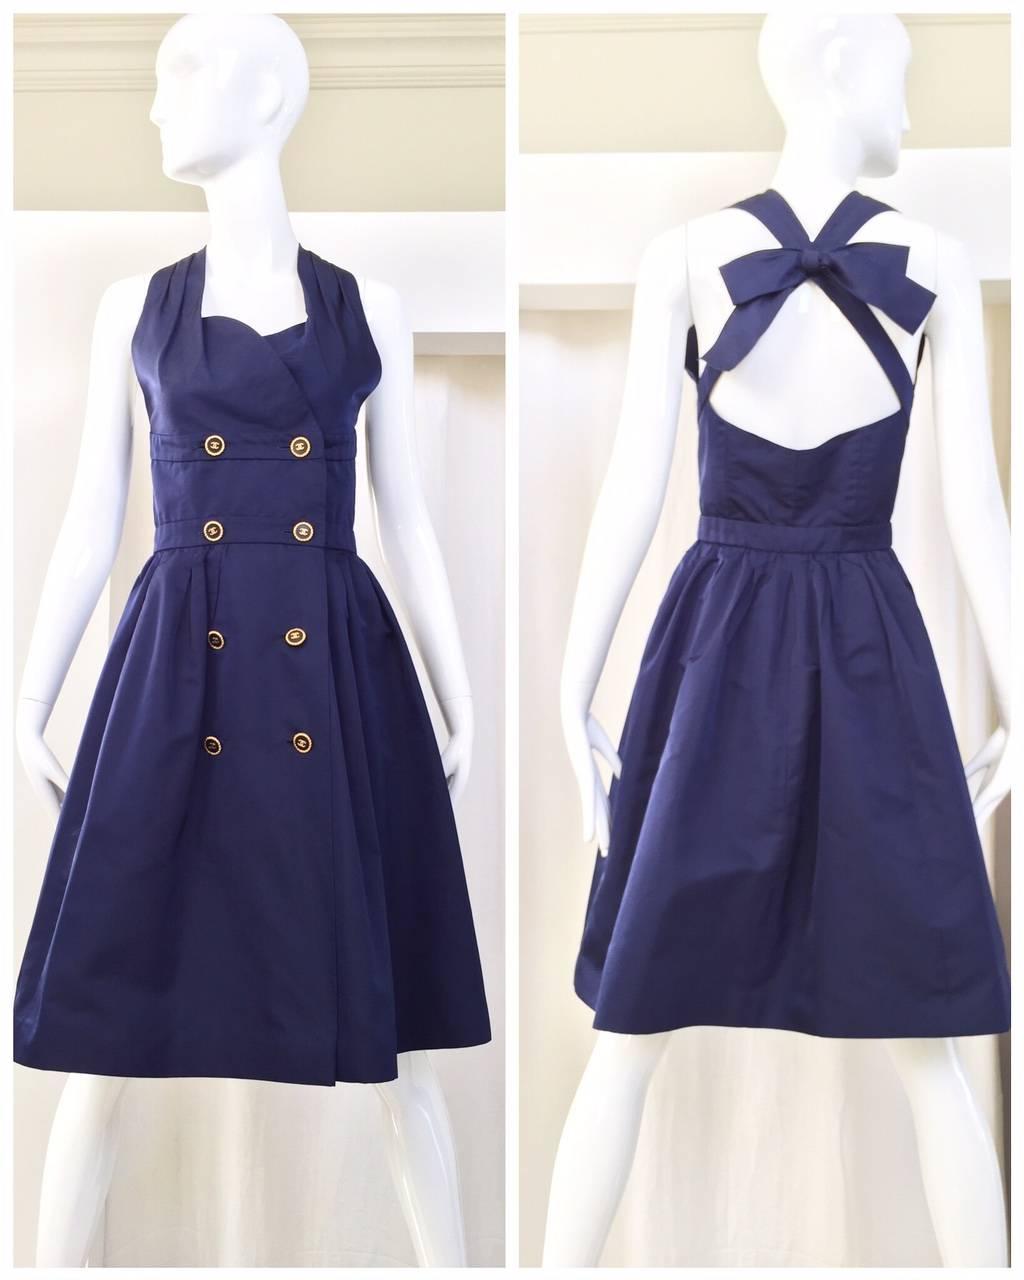 Chanel Cocktail Dresses